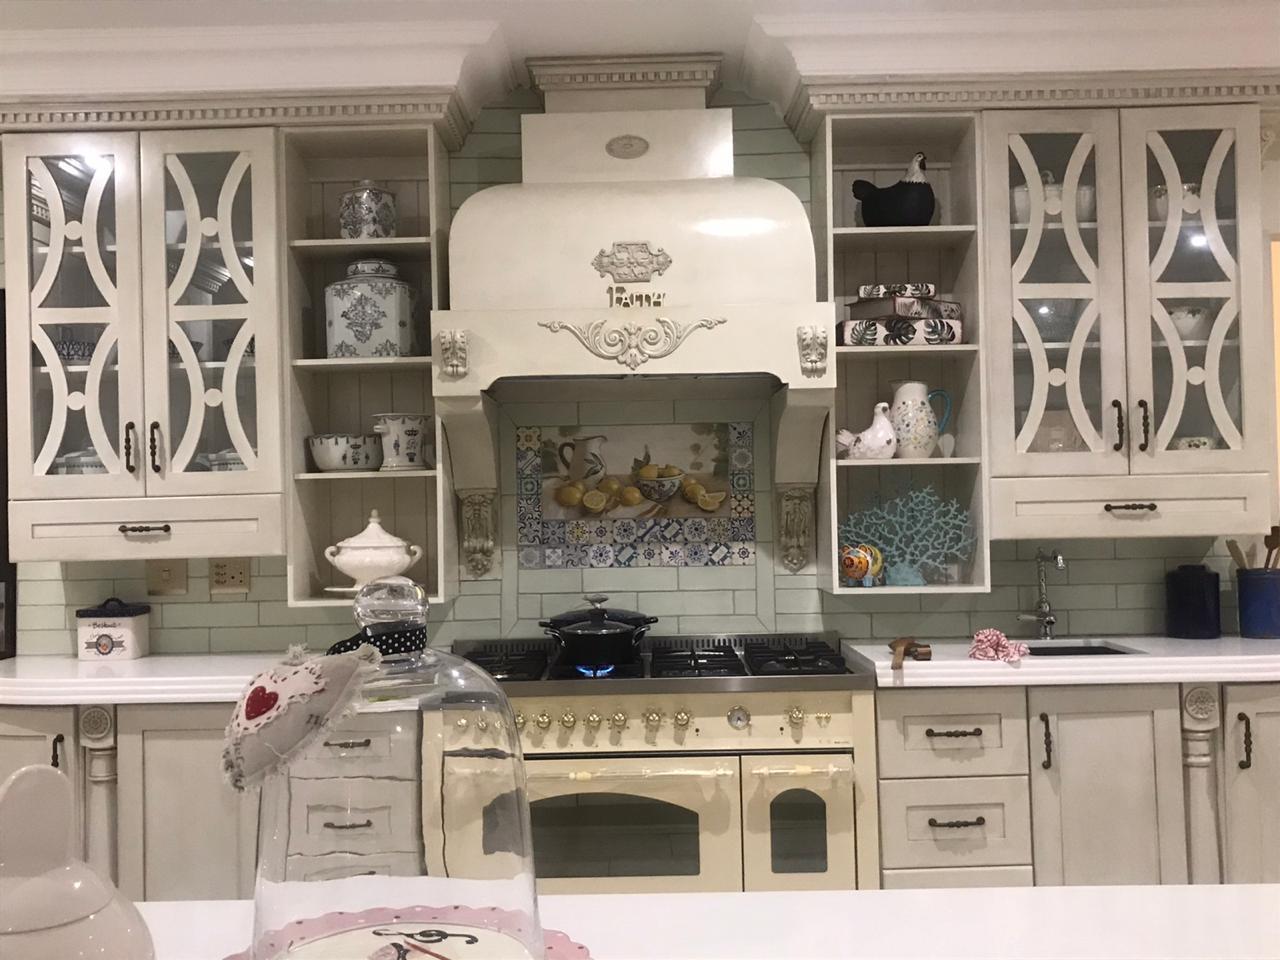 Lofra_Colonial_120cm_cooker